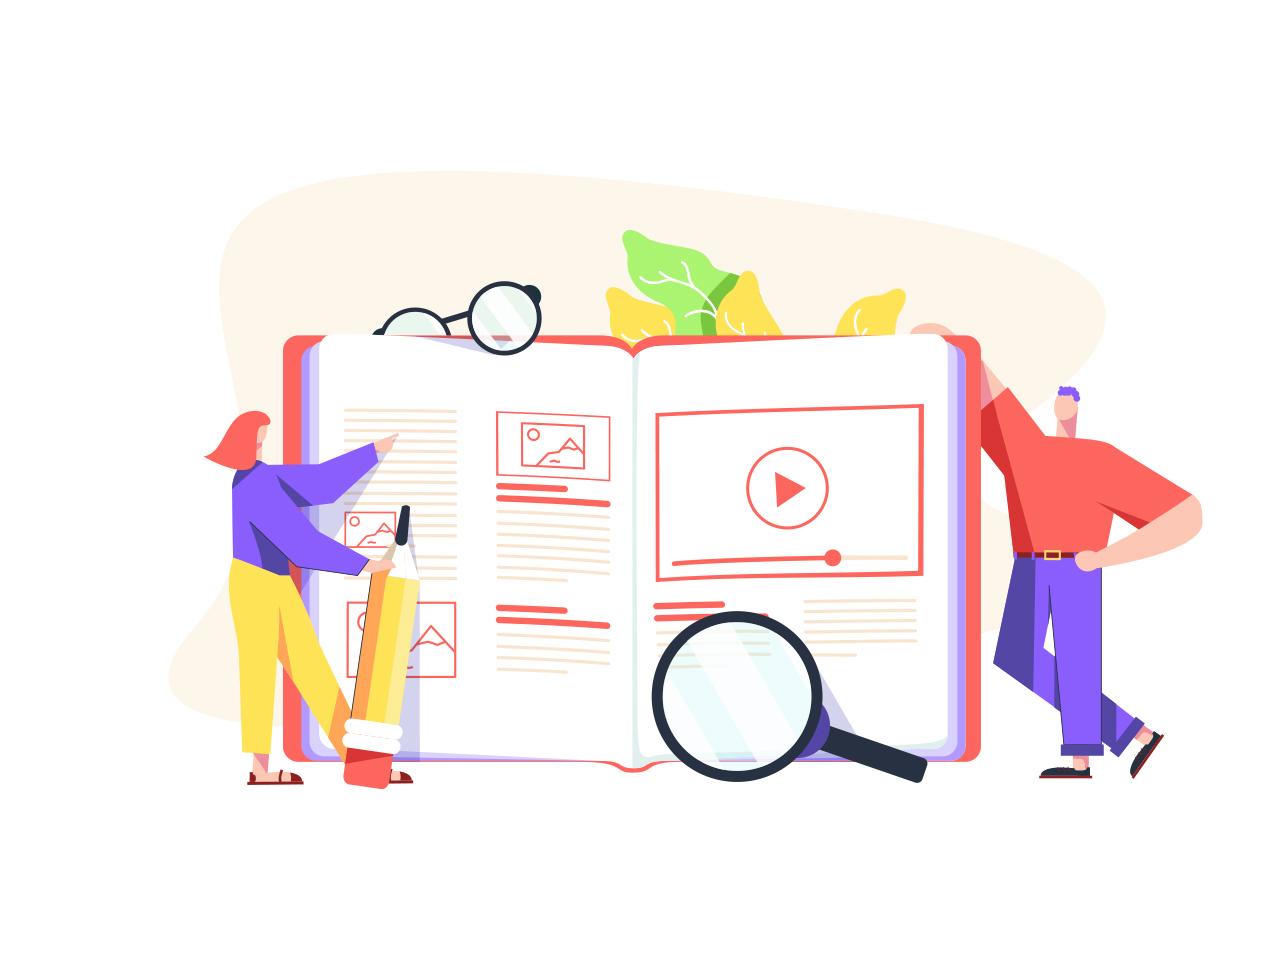 Educational platform illustration. Online Courses background university minimalism behance vector woman man people school character design app online courses courses education book student study illustration